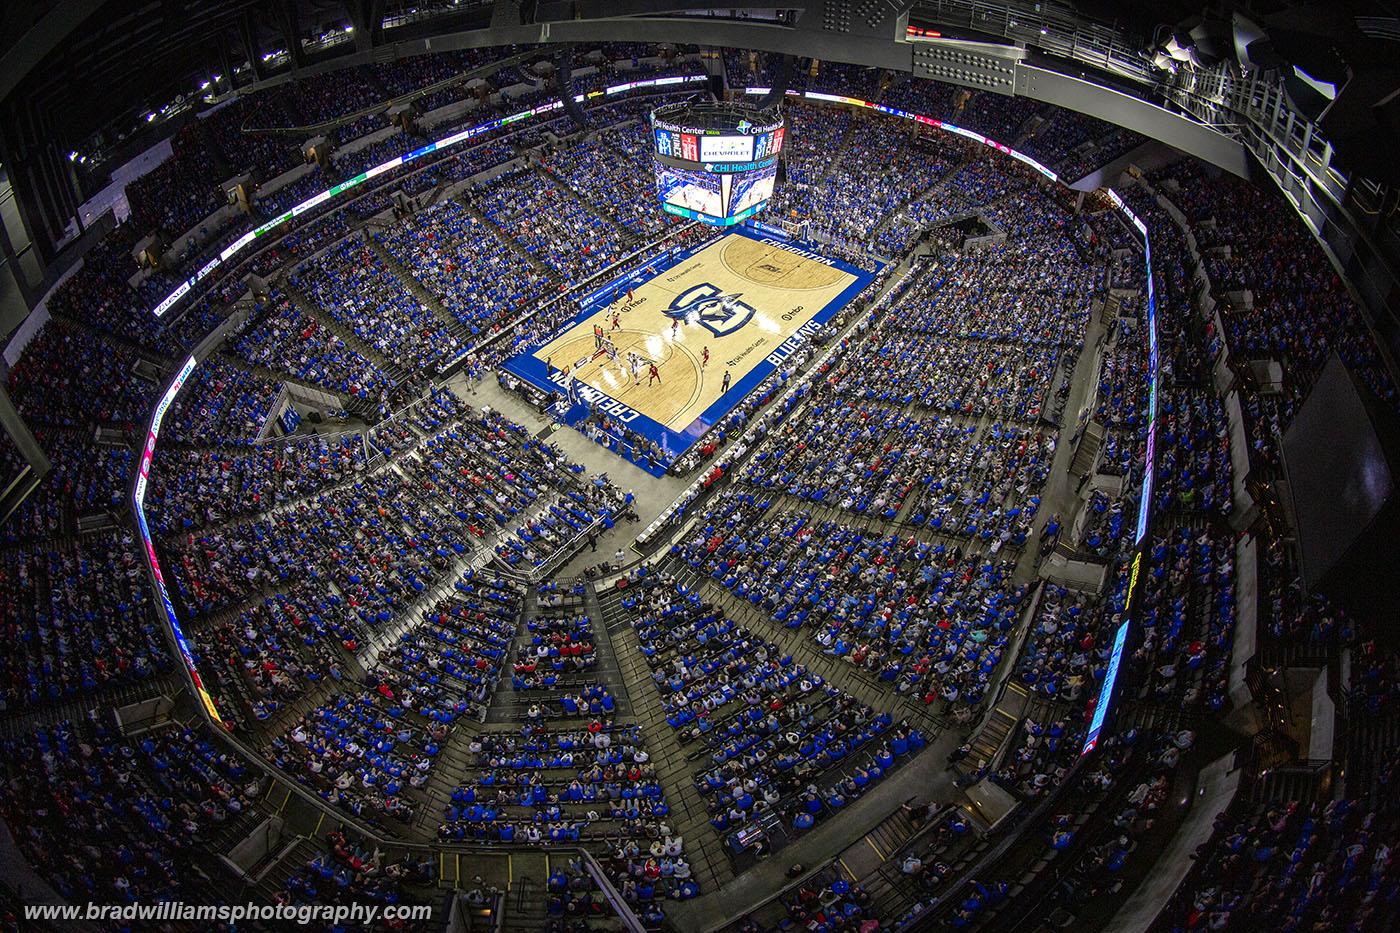 Creighton VS Nebraska 12/7/2019, Attendance = 18,068